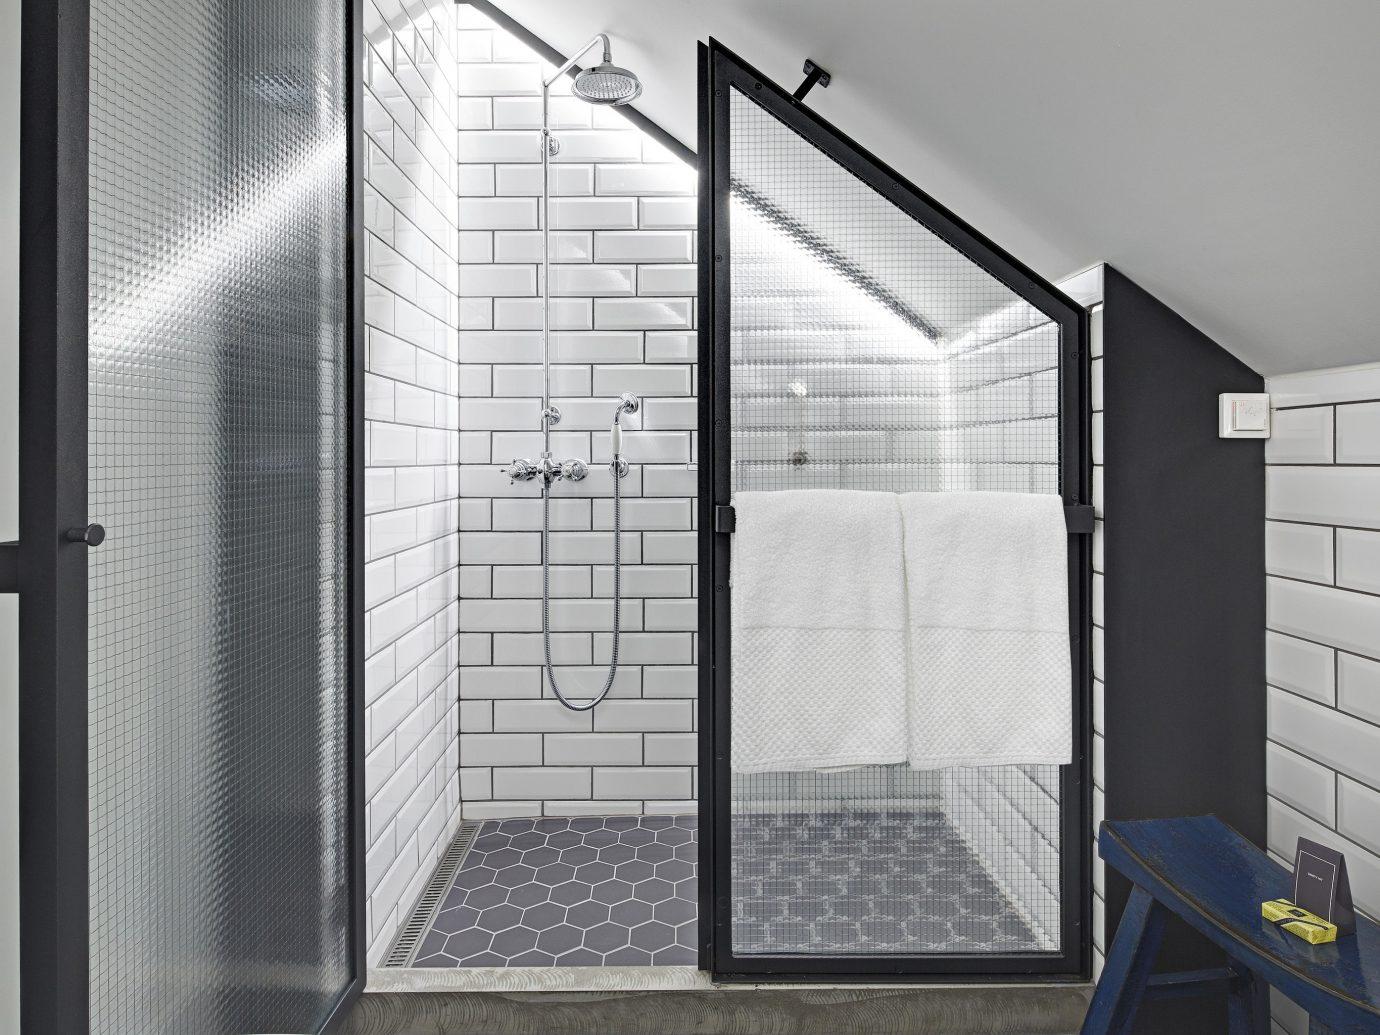 Boutique Hotels Hotels Iceland Reykjavík wall indoor building product door interior design furniture window covering glass tiled